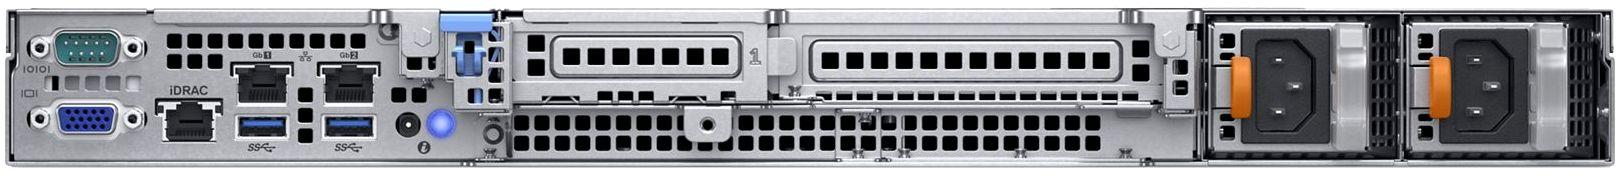 Dell EMC PowerEdge R340 Rear